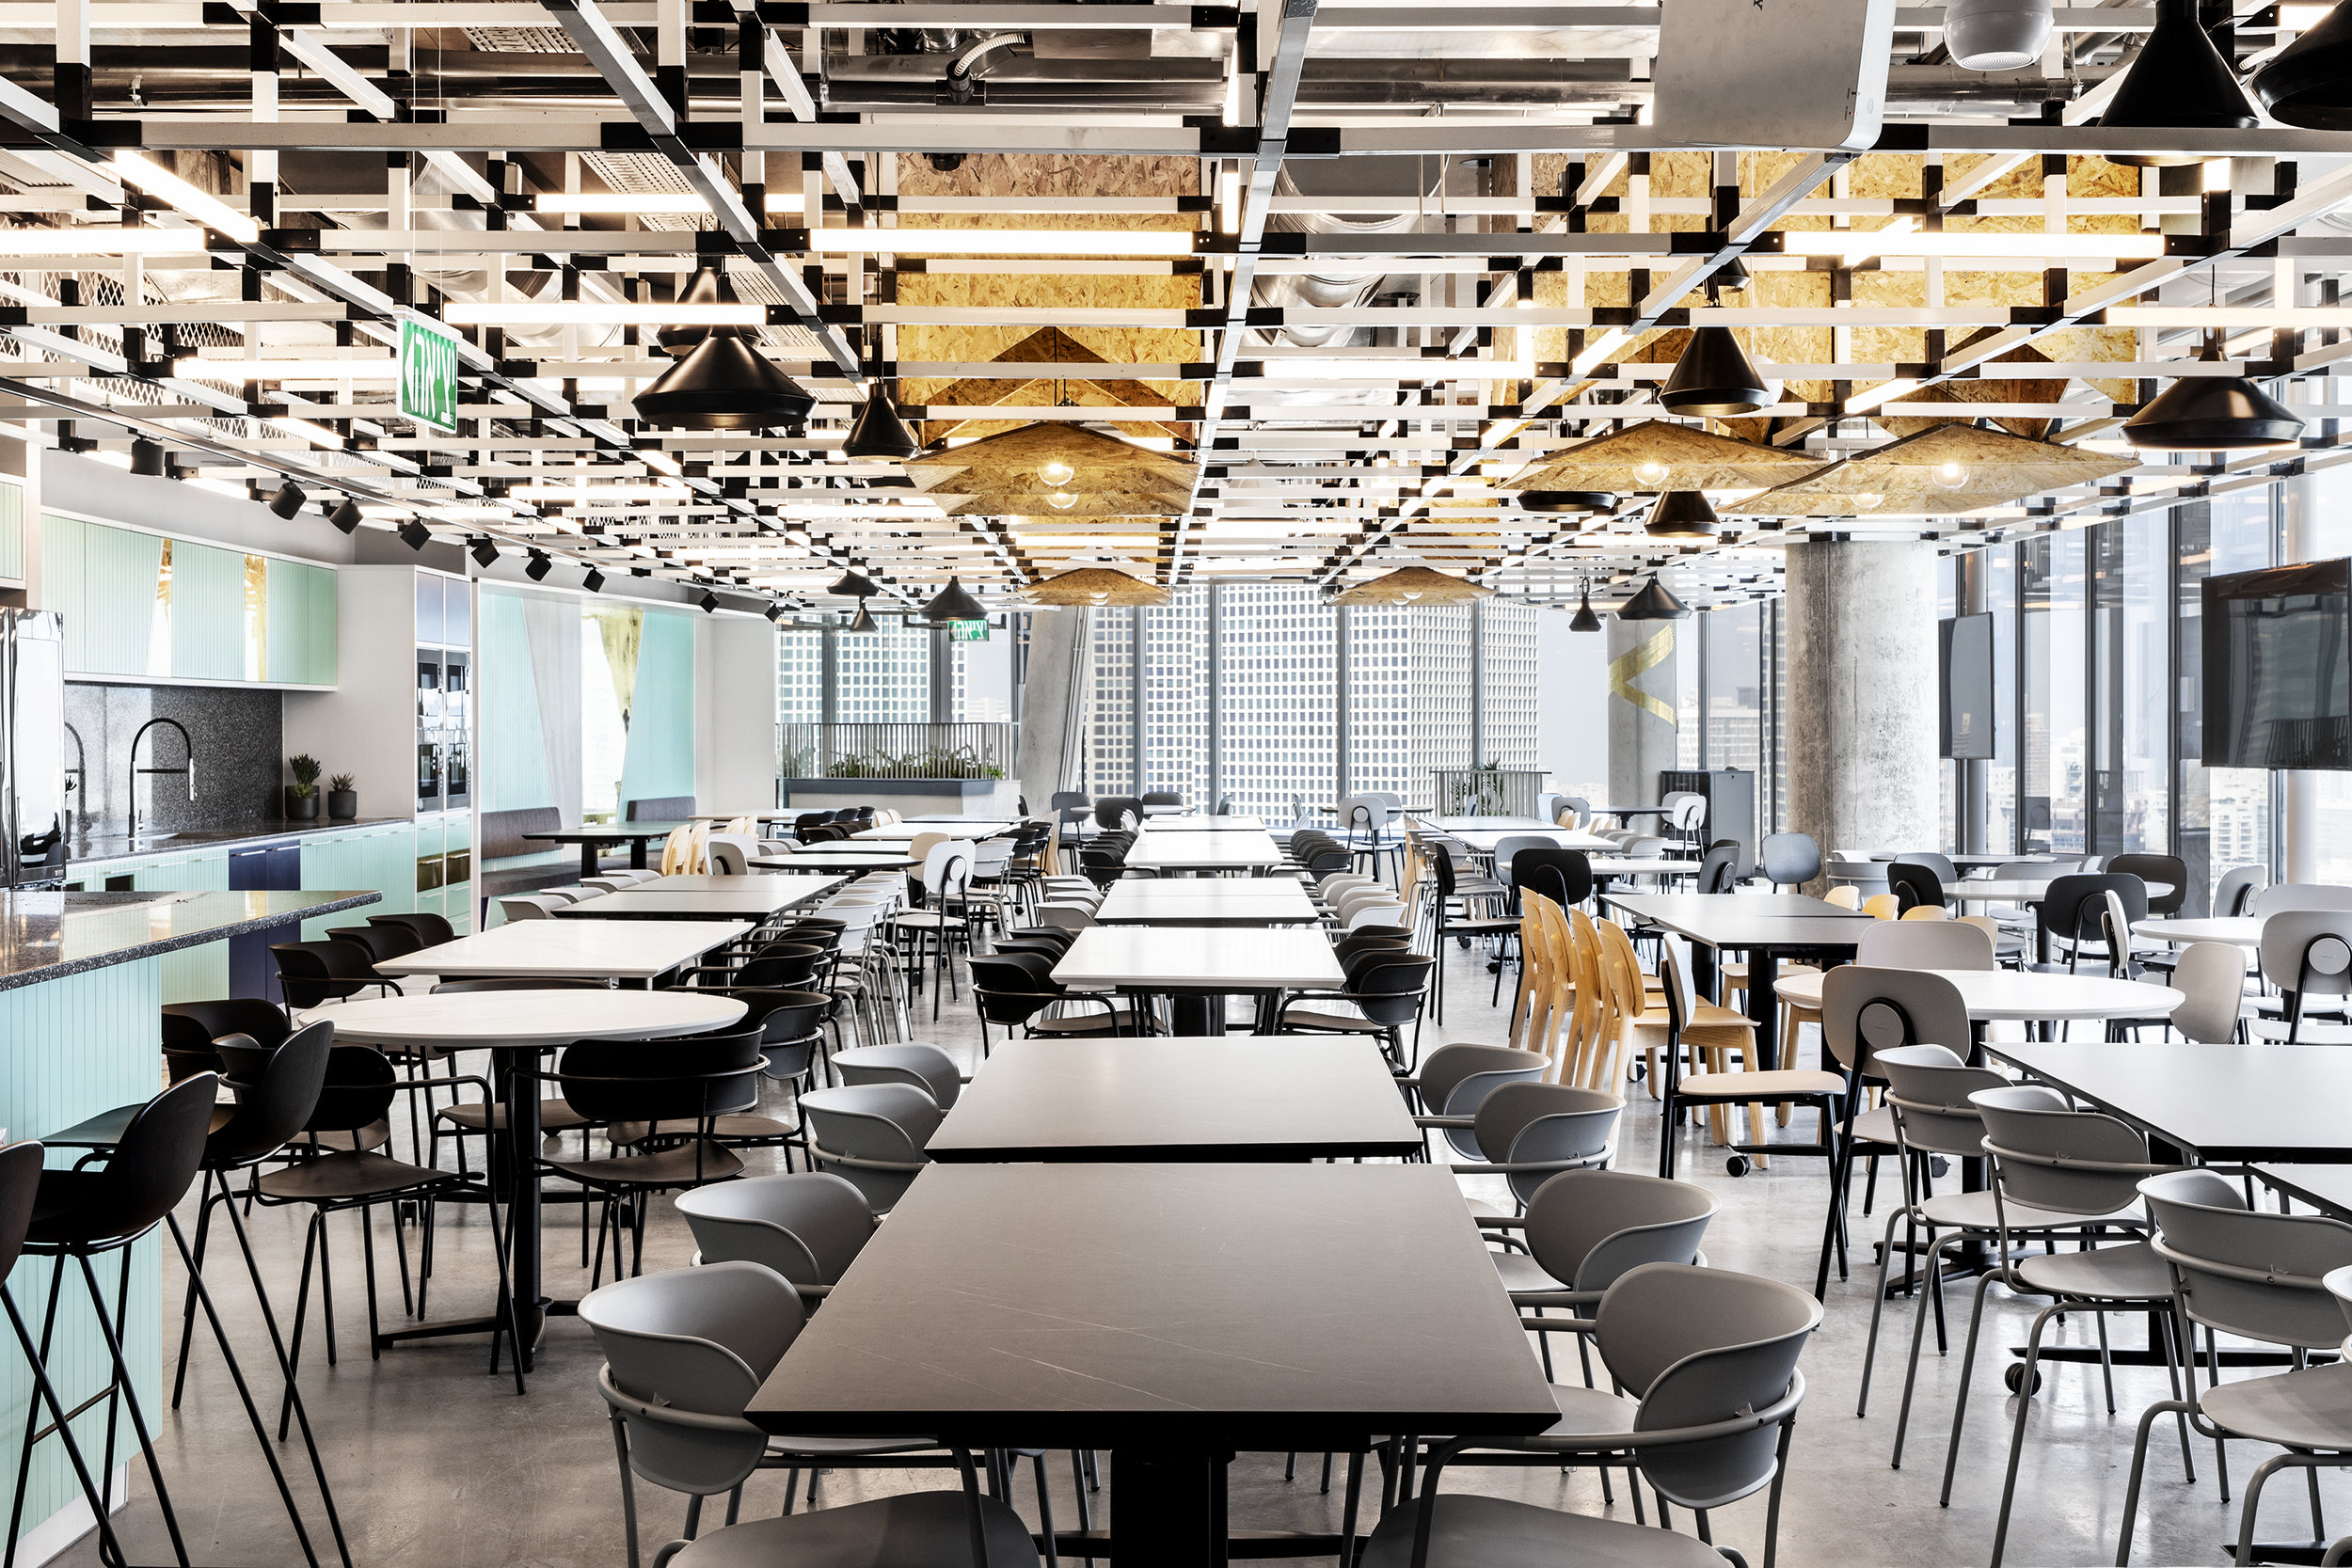 רואי דוד אדריכלות - אדריכל - נטורל אינטליג'נס - ROY DAVID - ARCHITECTURE - ARCHITECT - NI (16).jpg